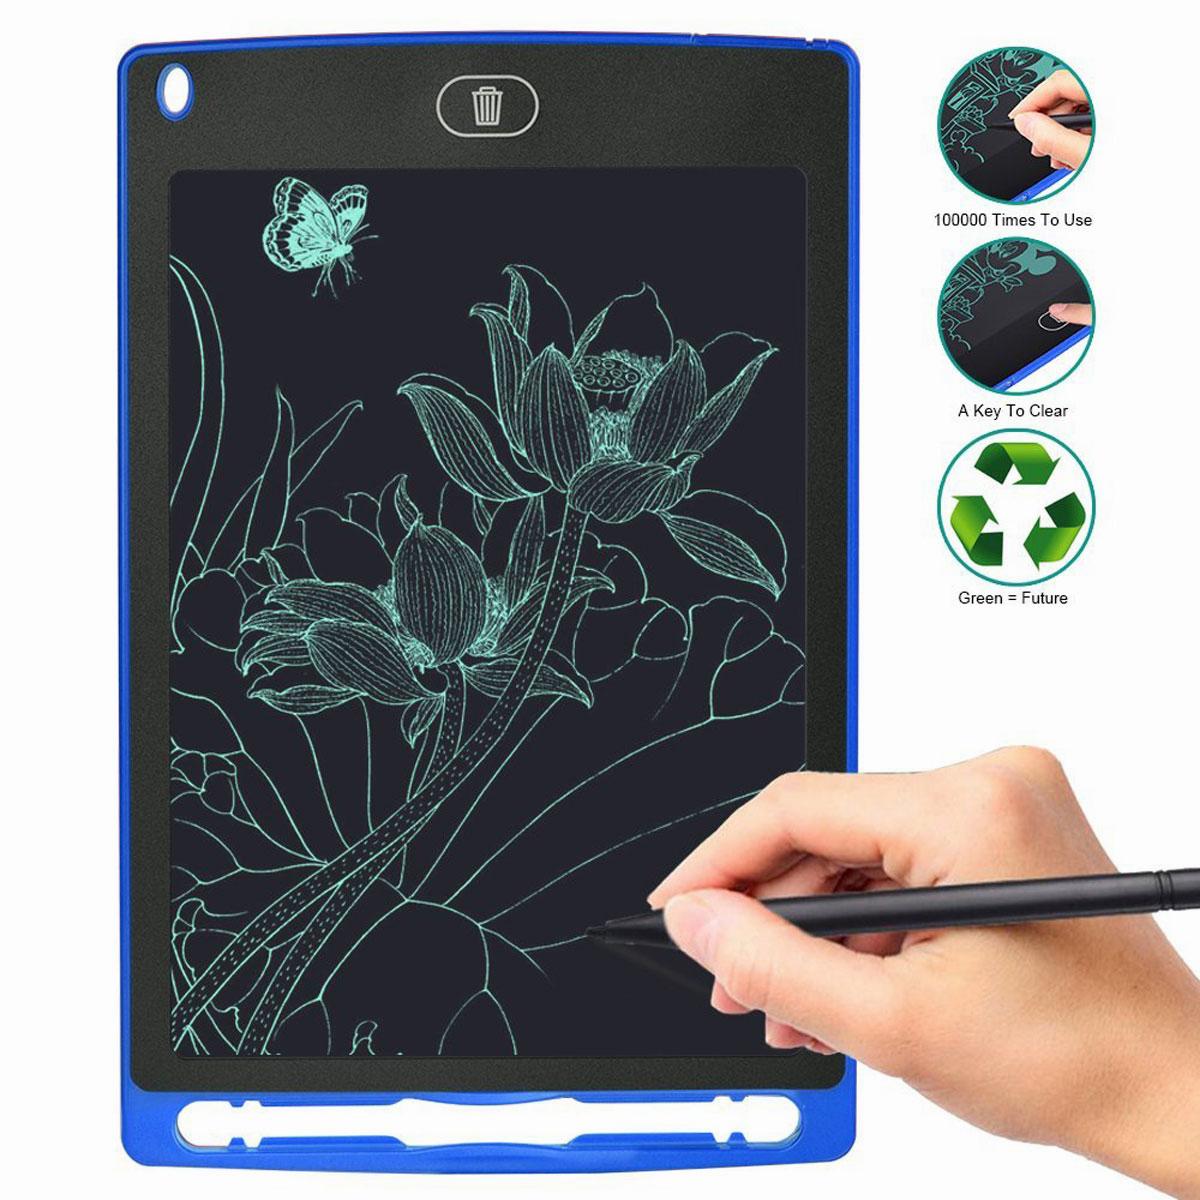 8-5-034-Digital-Electronic-LCD-Writing-Tablet-Drawing-Pad-eWriter-Board-For-Kids thumbnail 21